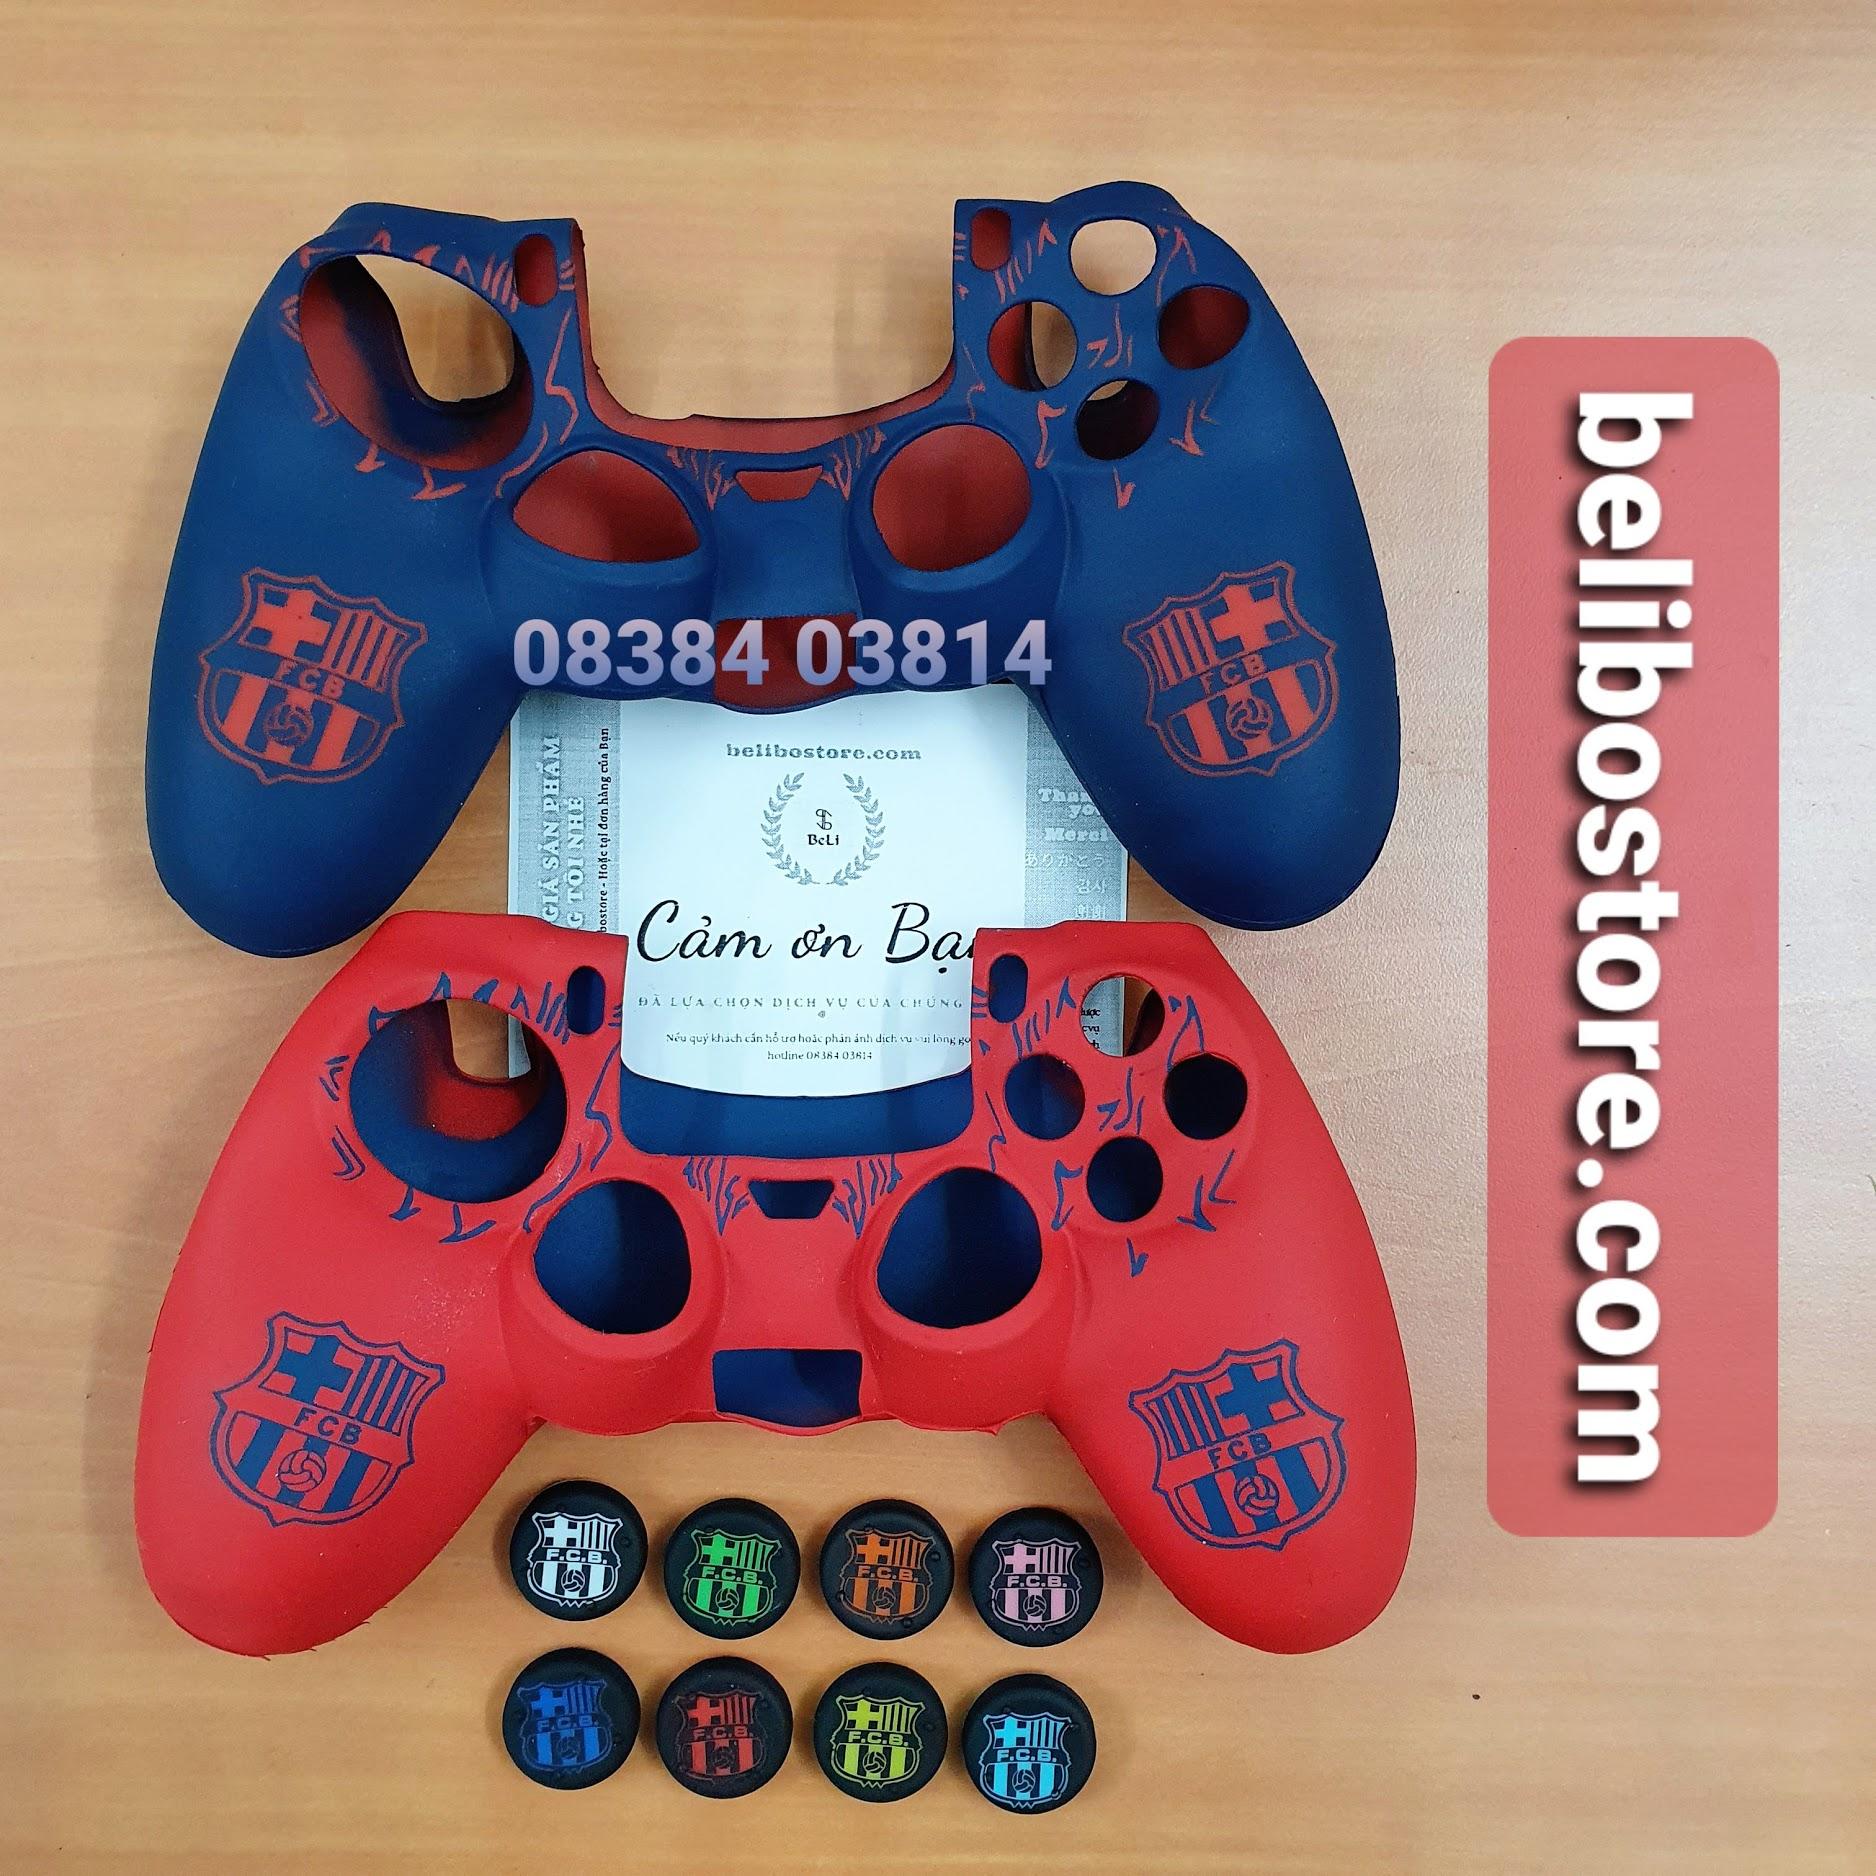 vo-bo-c-cao-su-silicon-mem-bao-ve-tay-cam-choi-game-ps4-dualshock-4-barcelona-ba